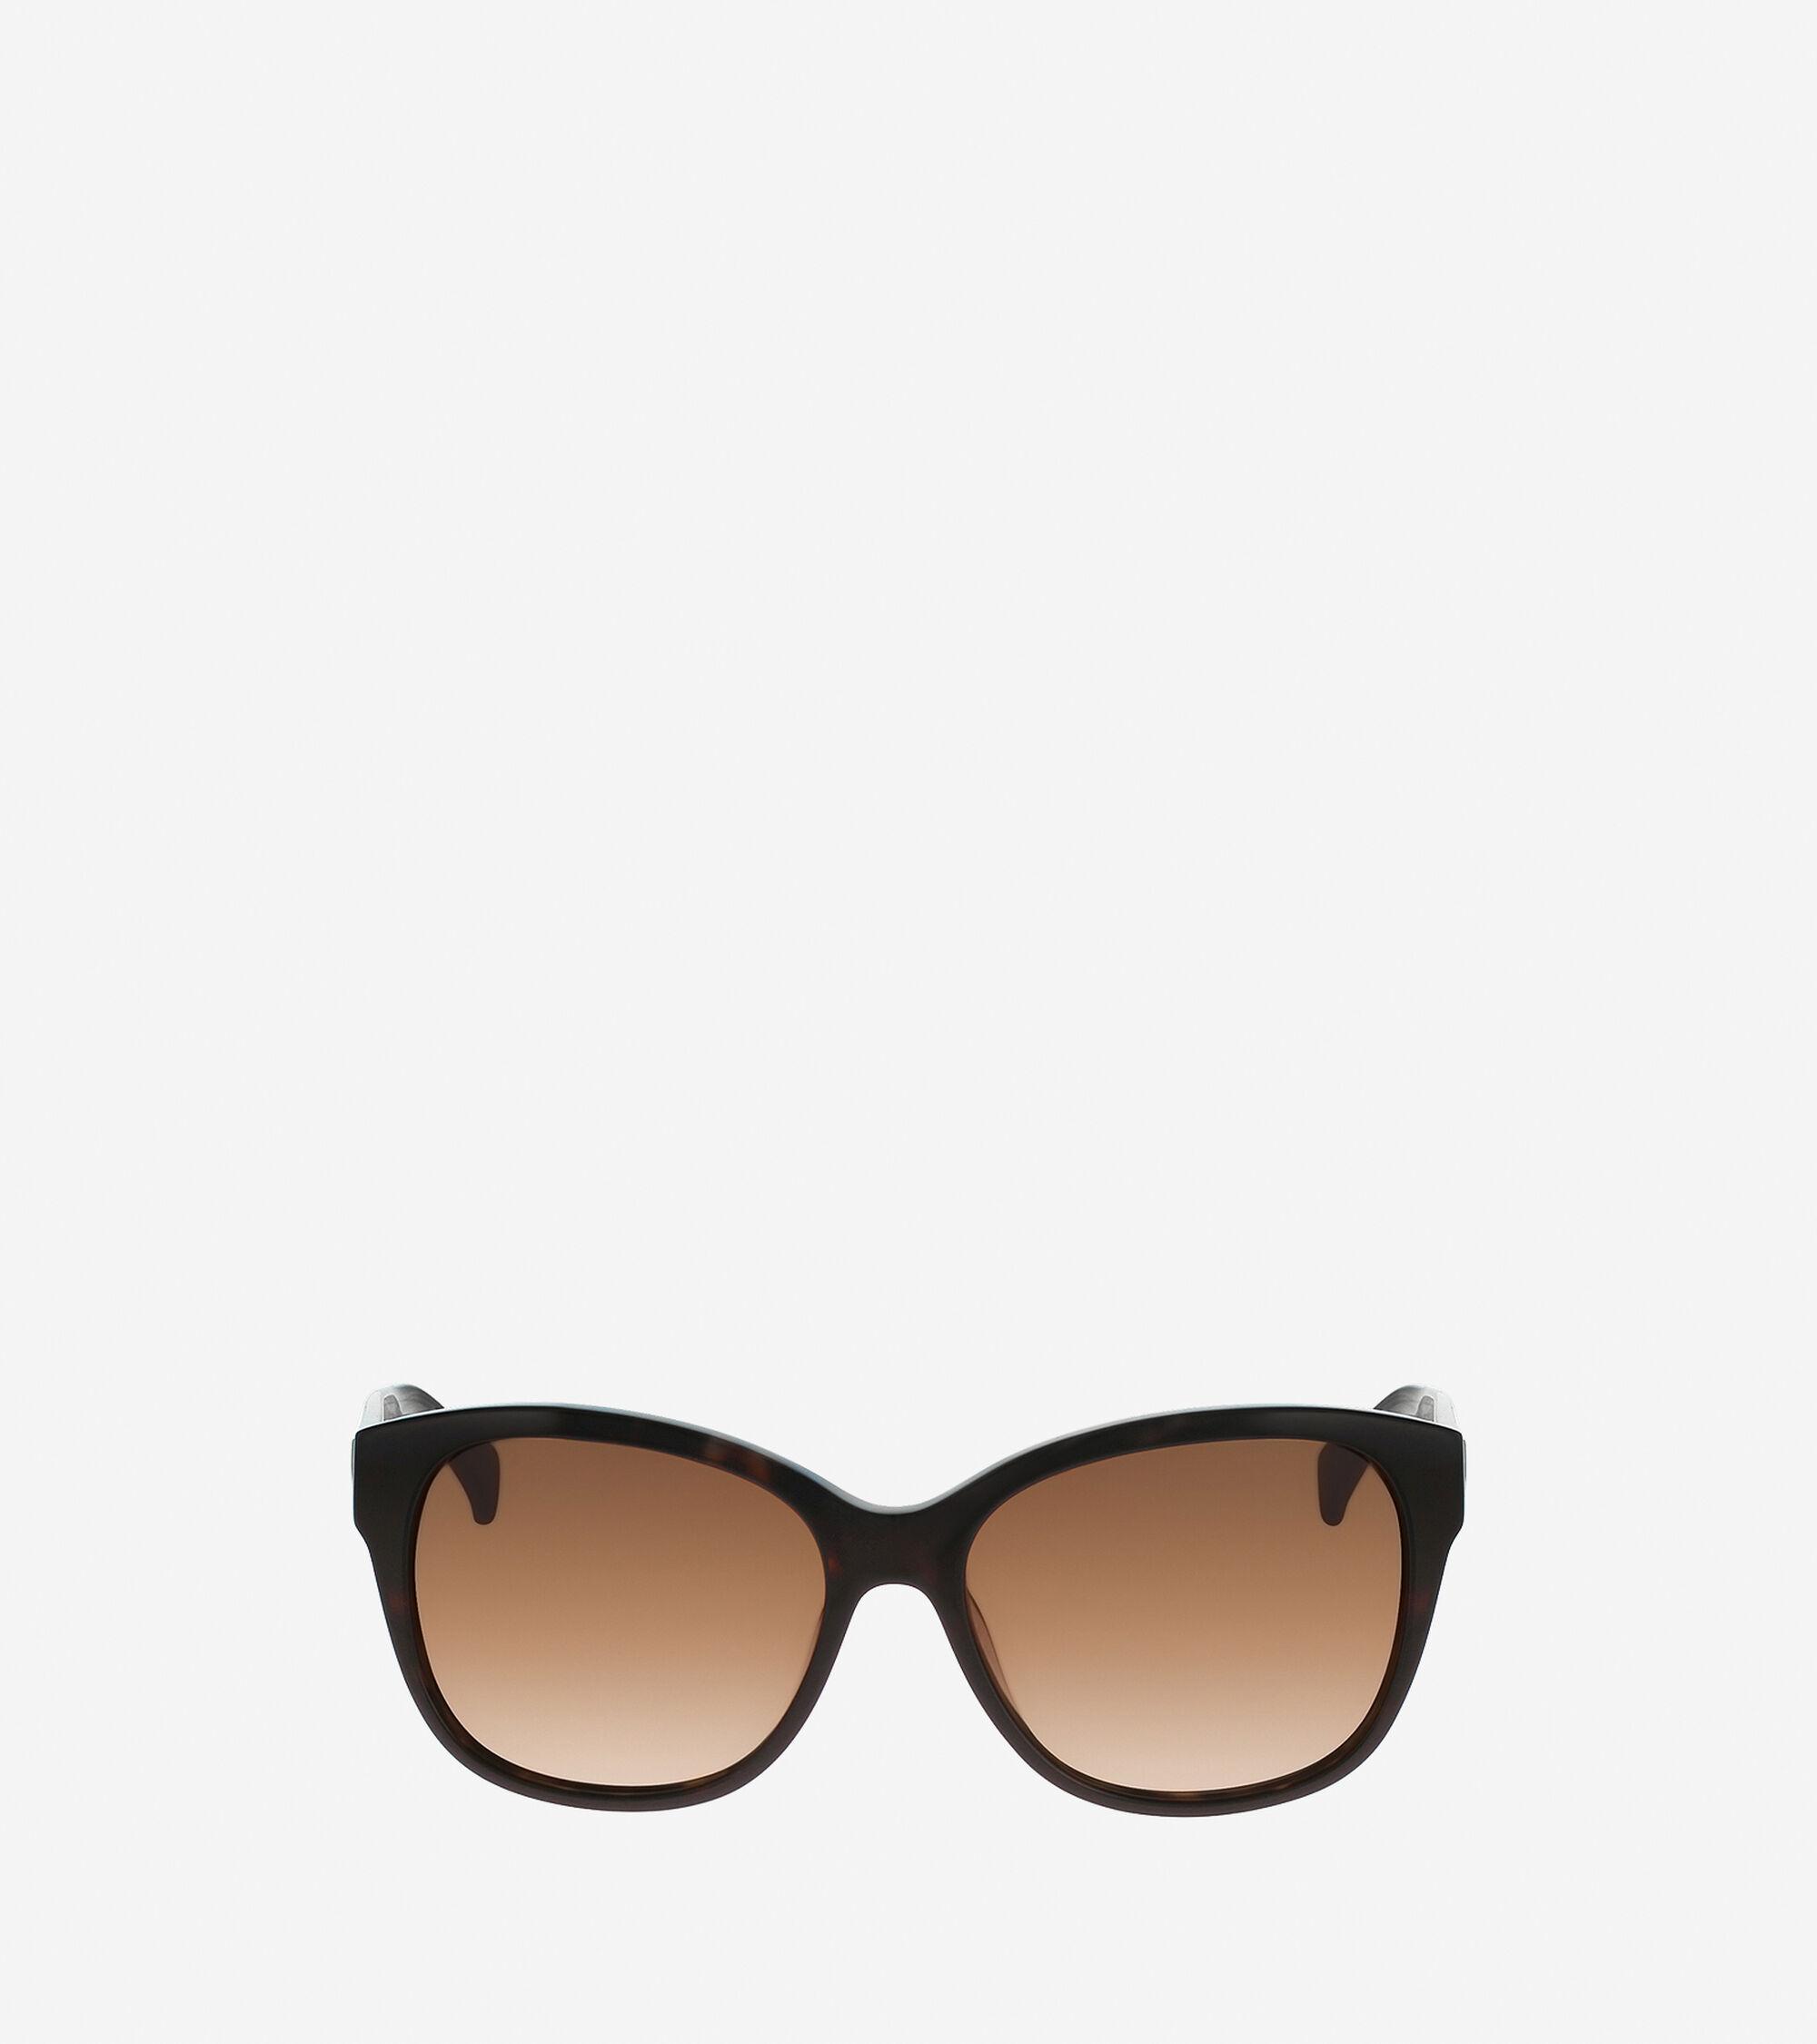 Sunglasses > Rounded Square Sunglasses